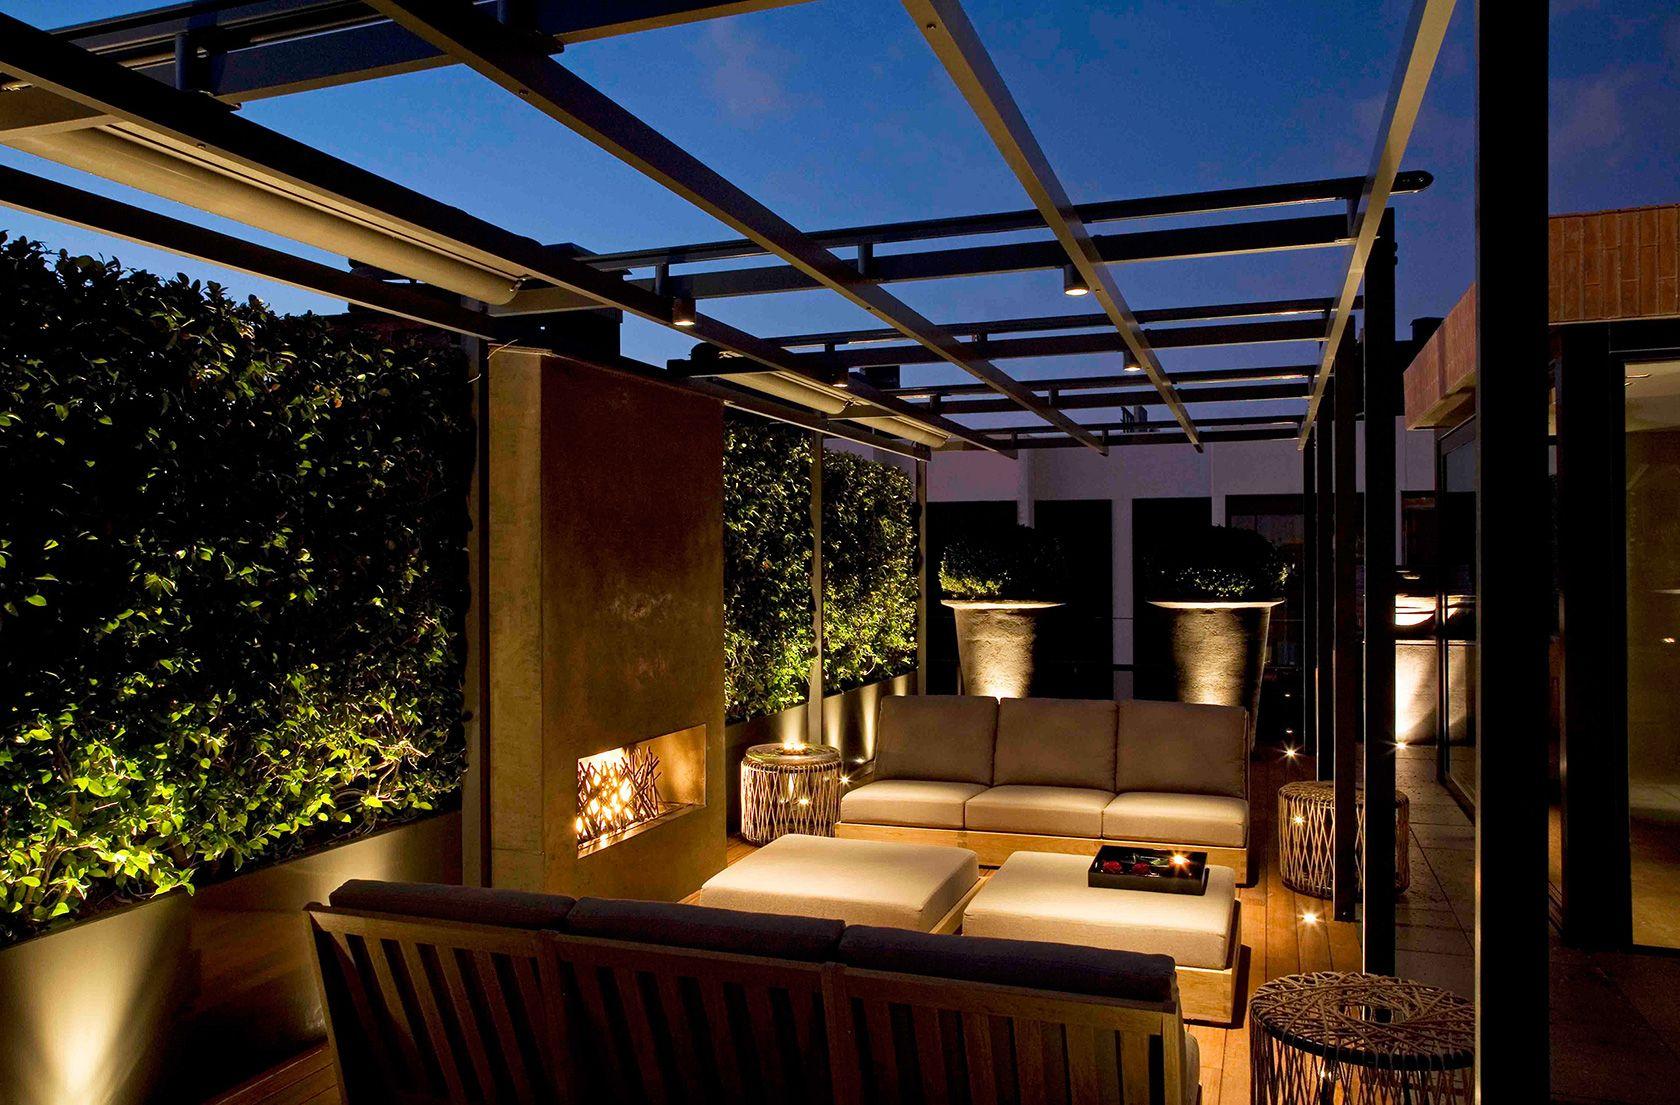 Luciano Giubbilei Barcelona Roof terrace design